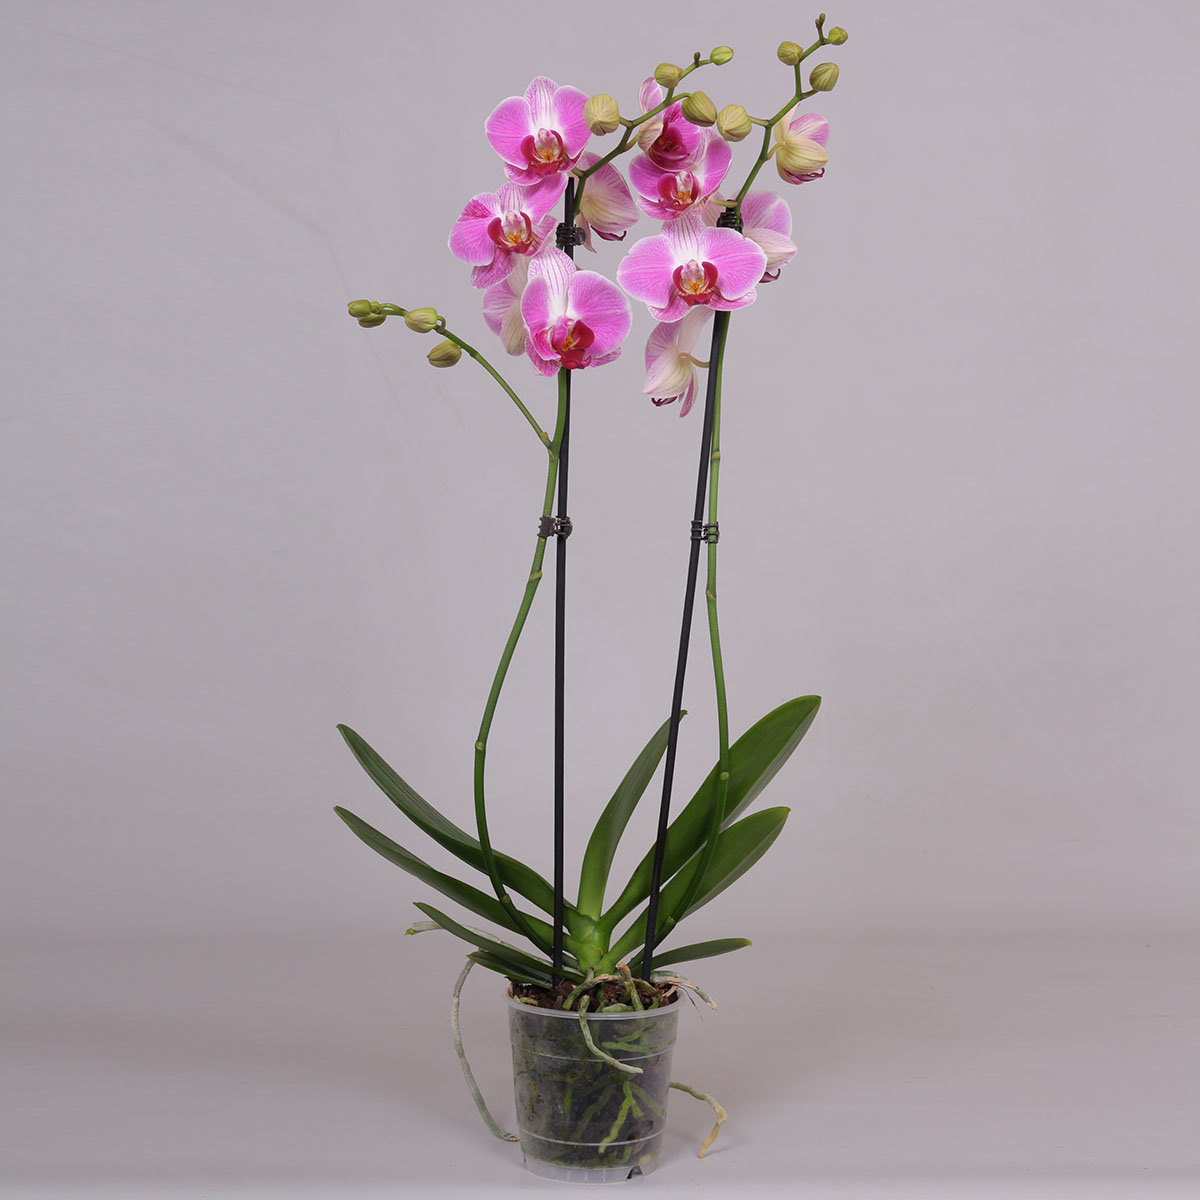 Rosa Schmetterlings-Orchidee, im ca. 12 cm-Topf   #3